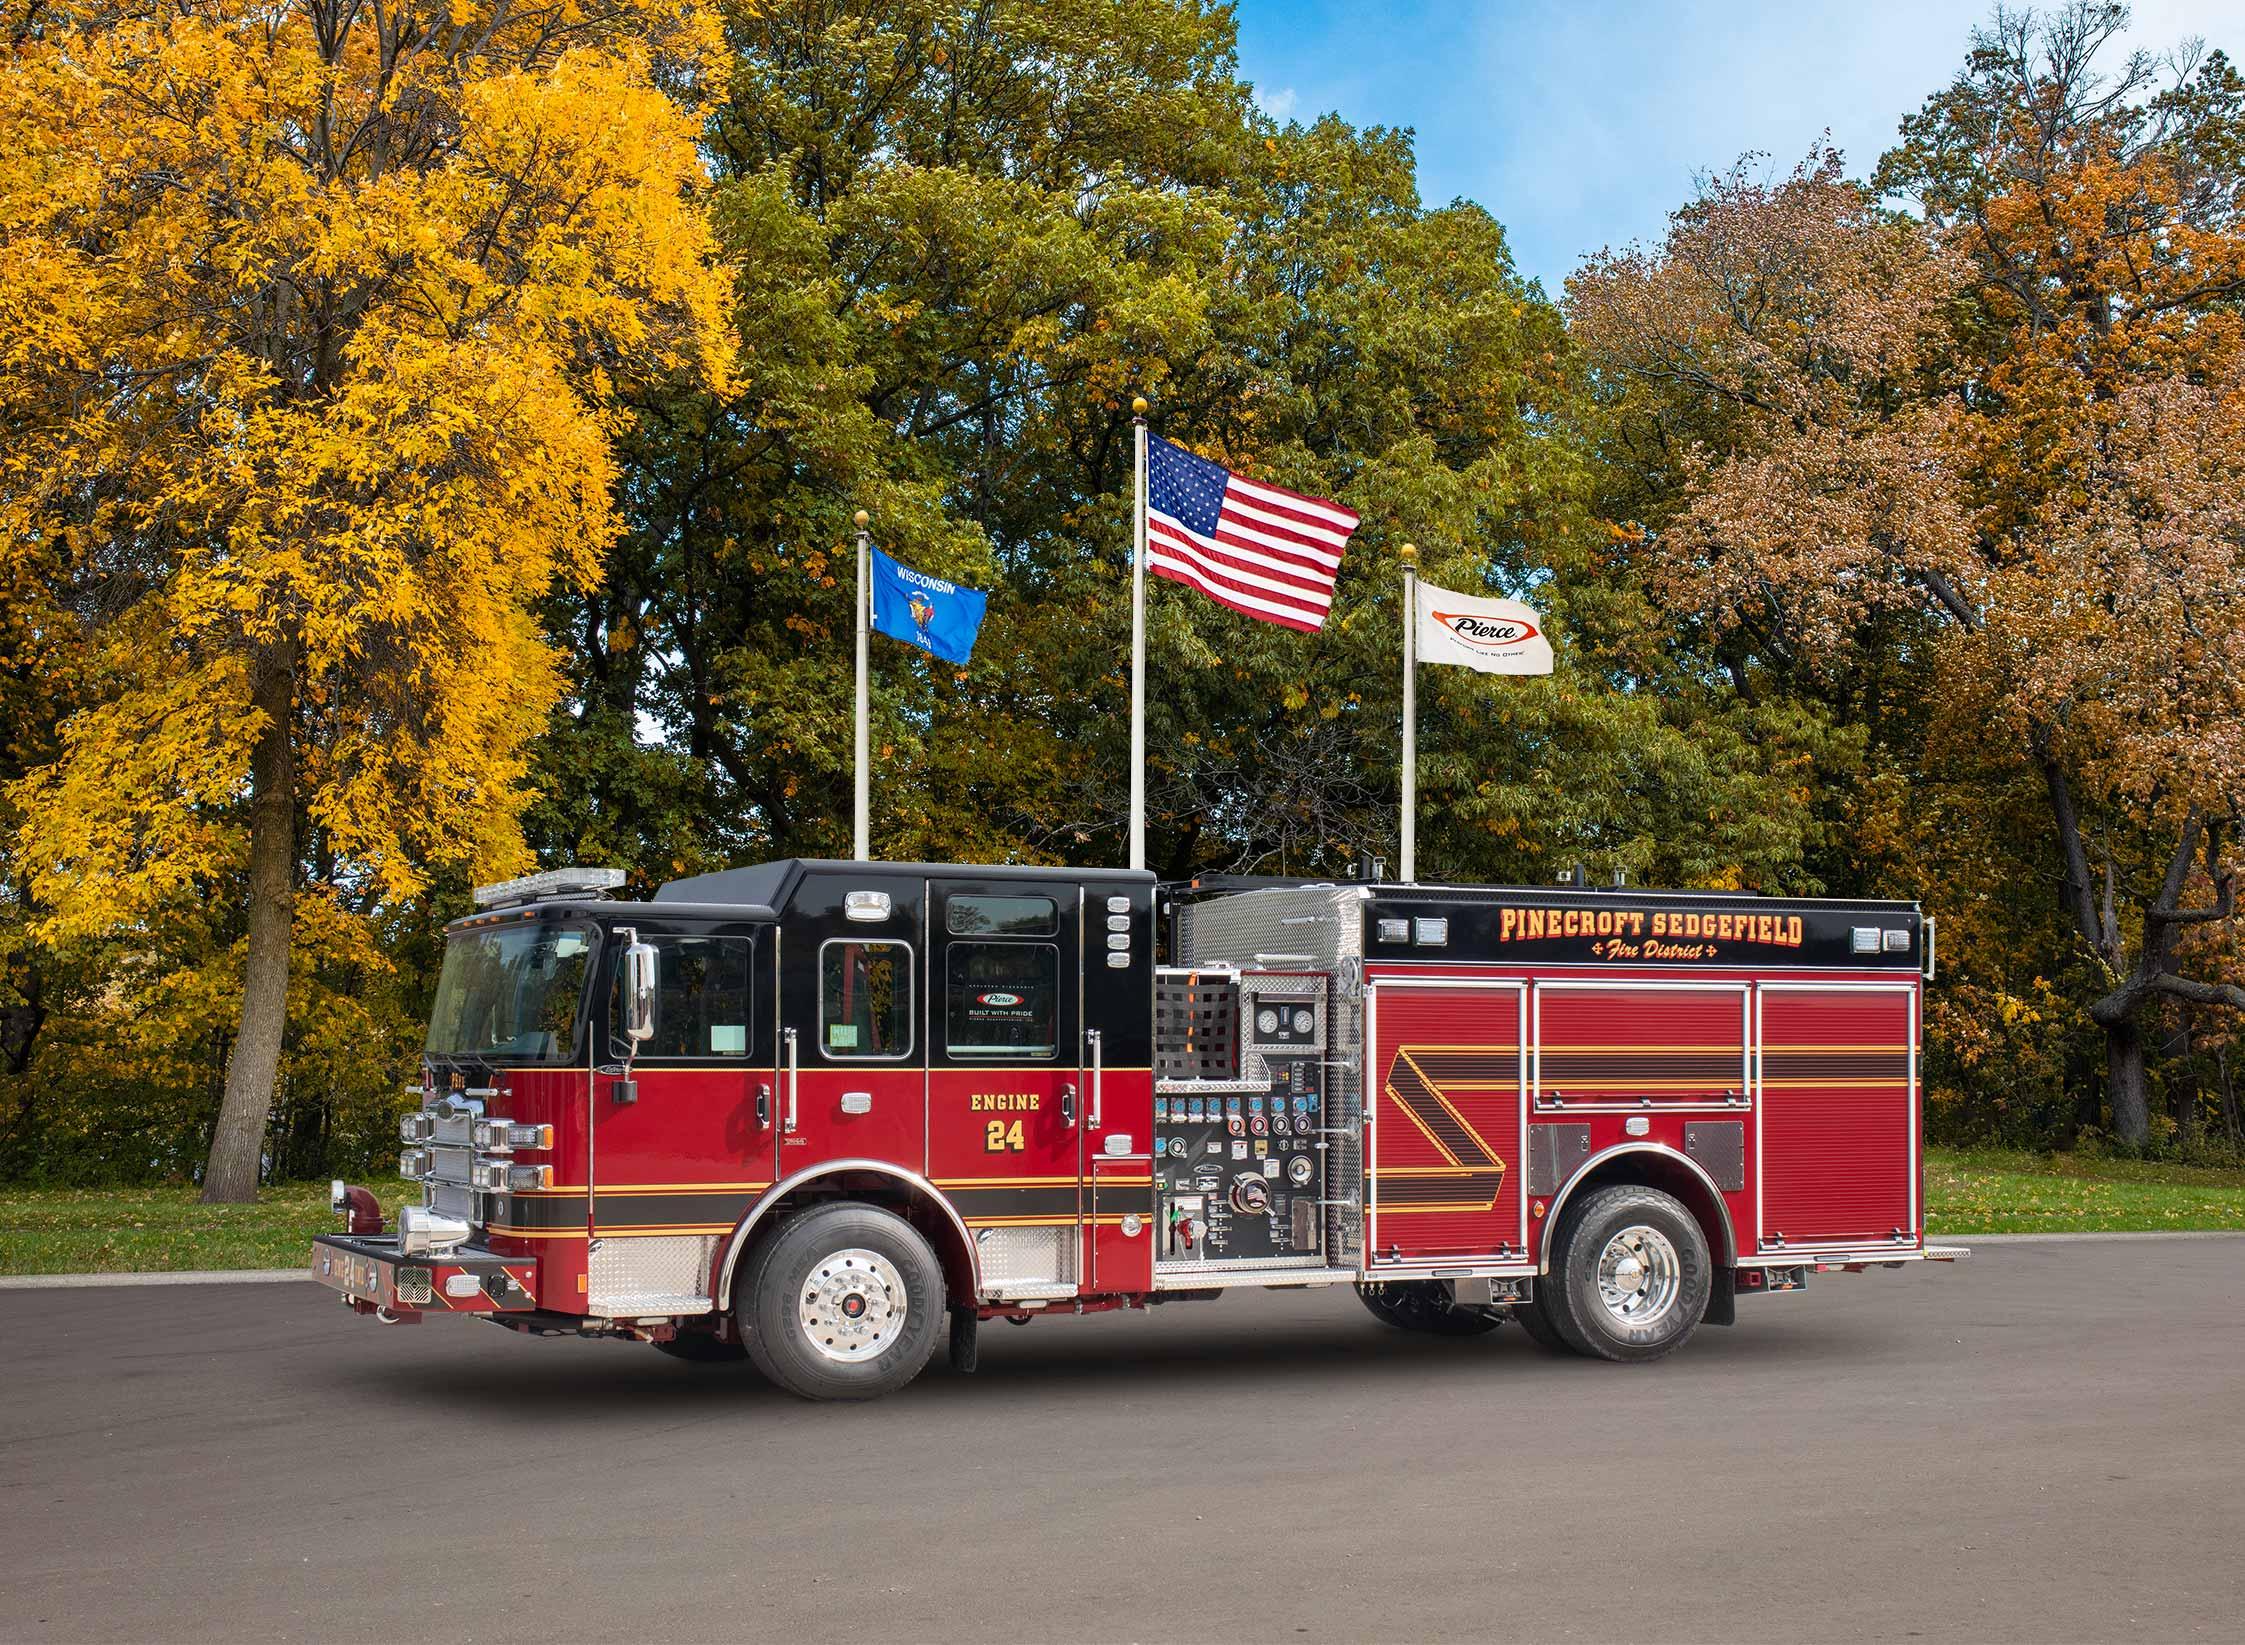 Pinecroft-Sedgefield Fire Department - Pumper